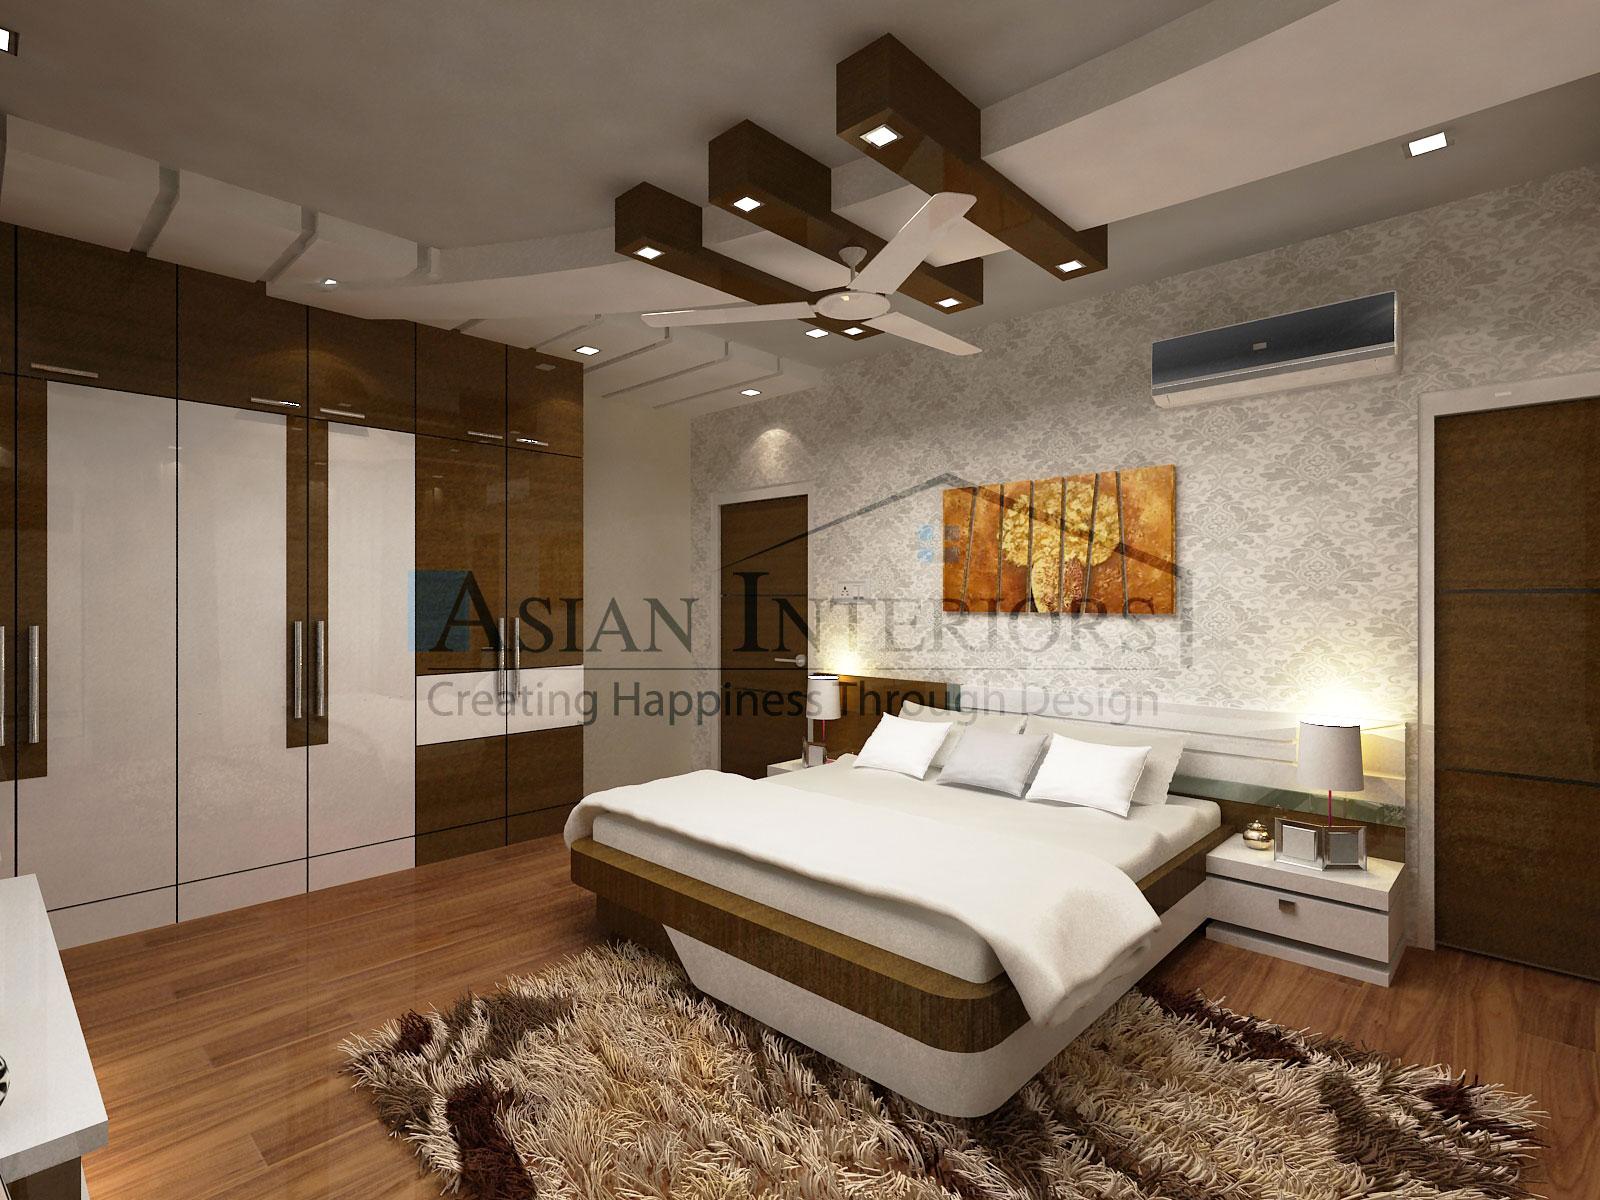 Asian-Interiors-BedRoom18